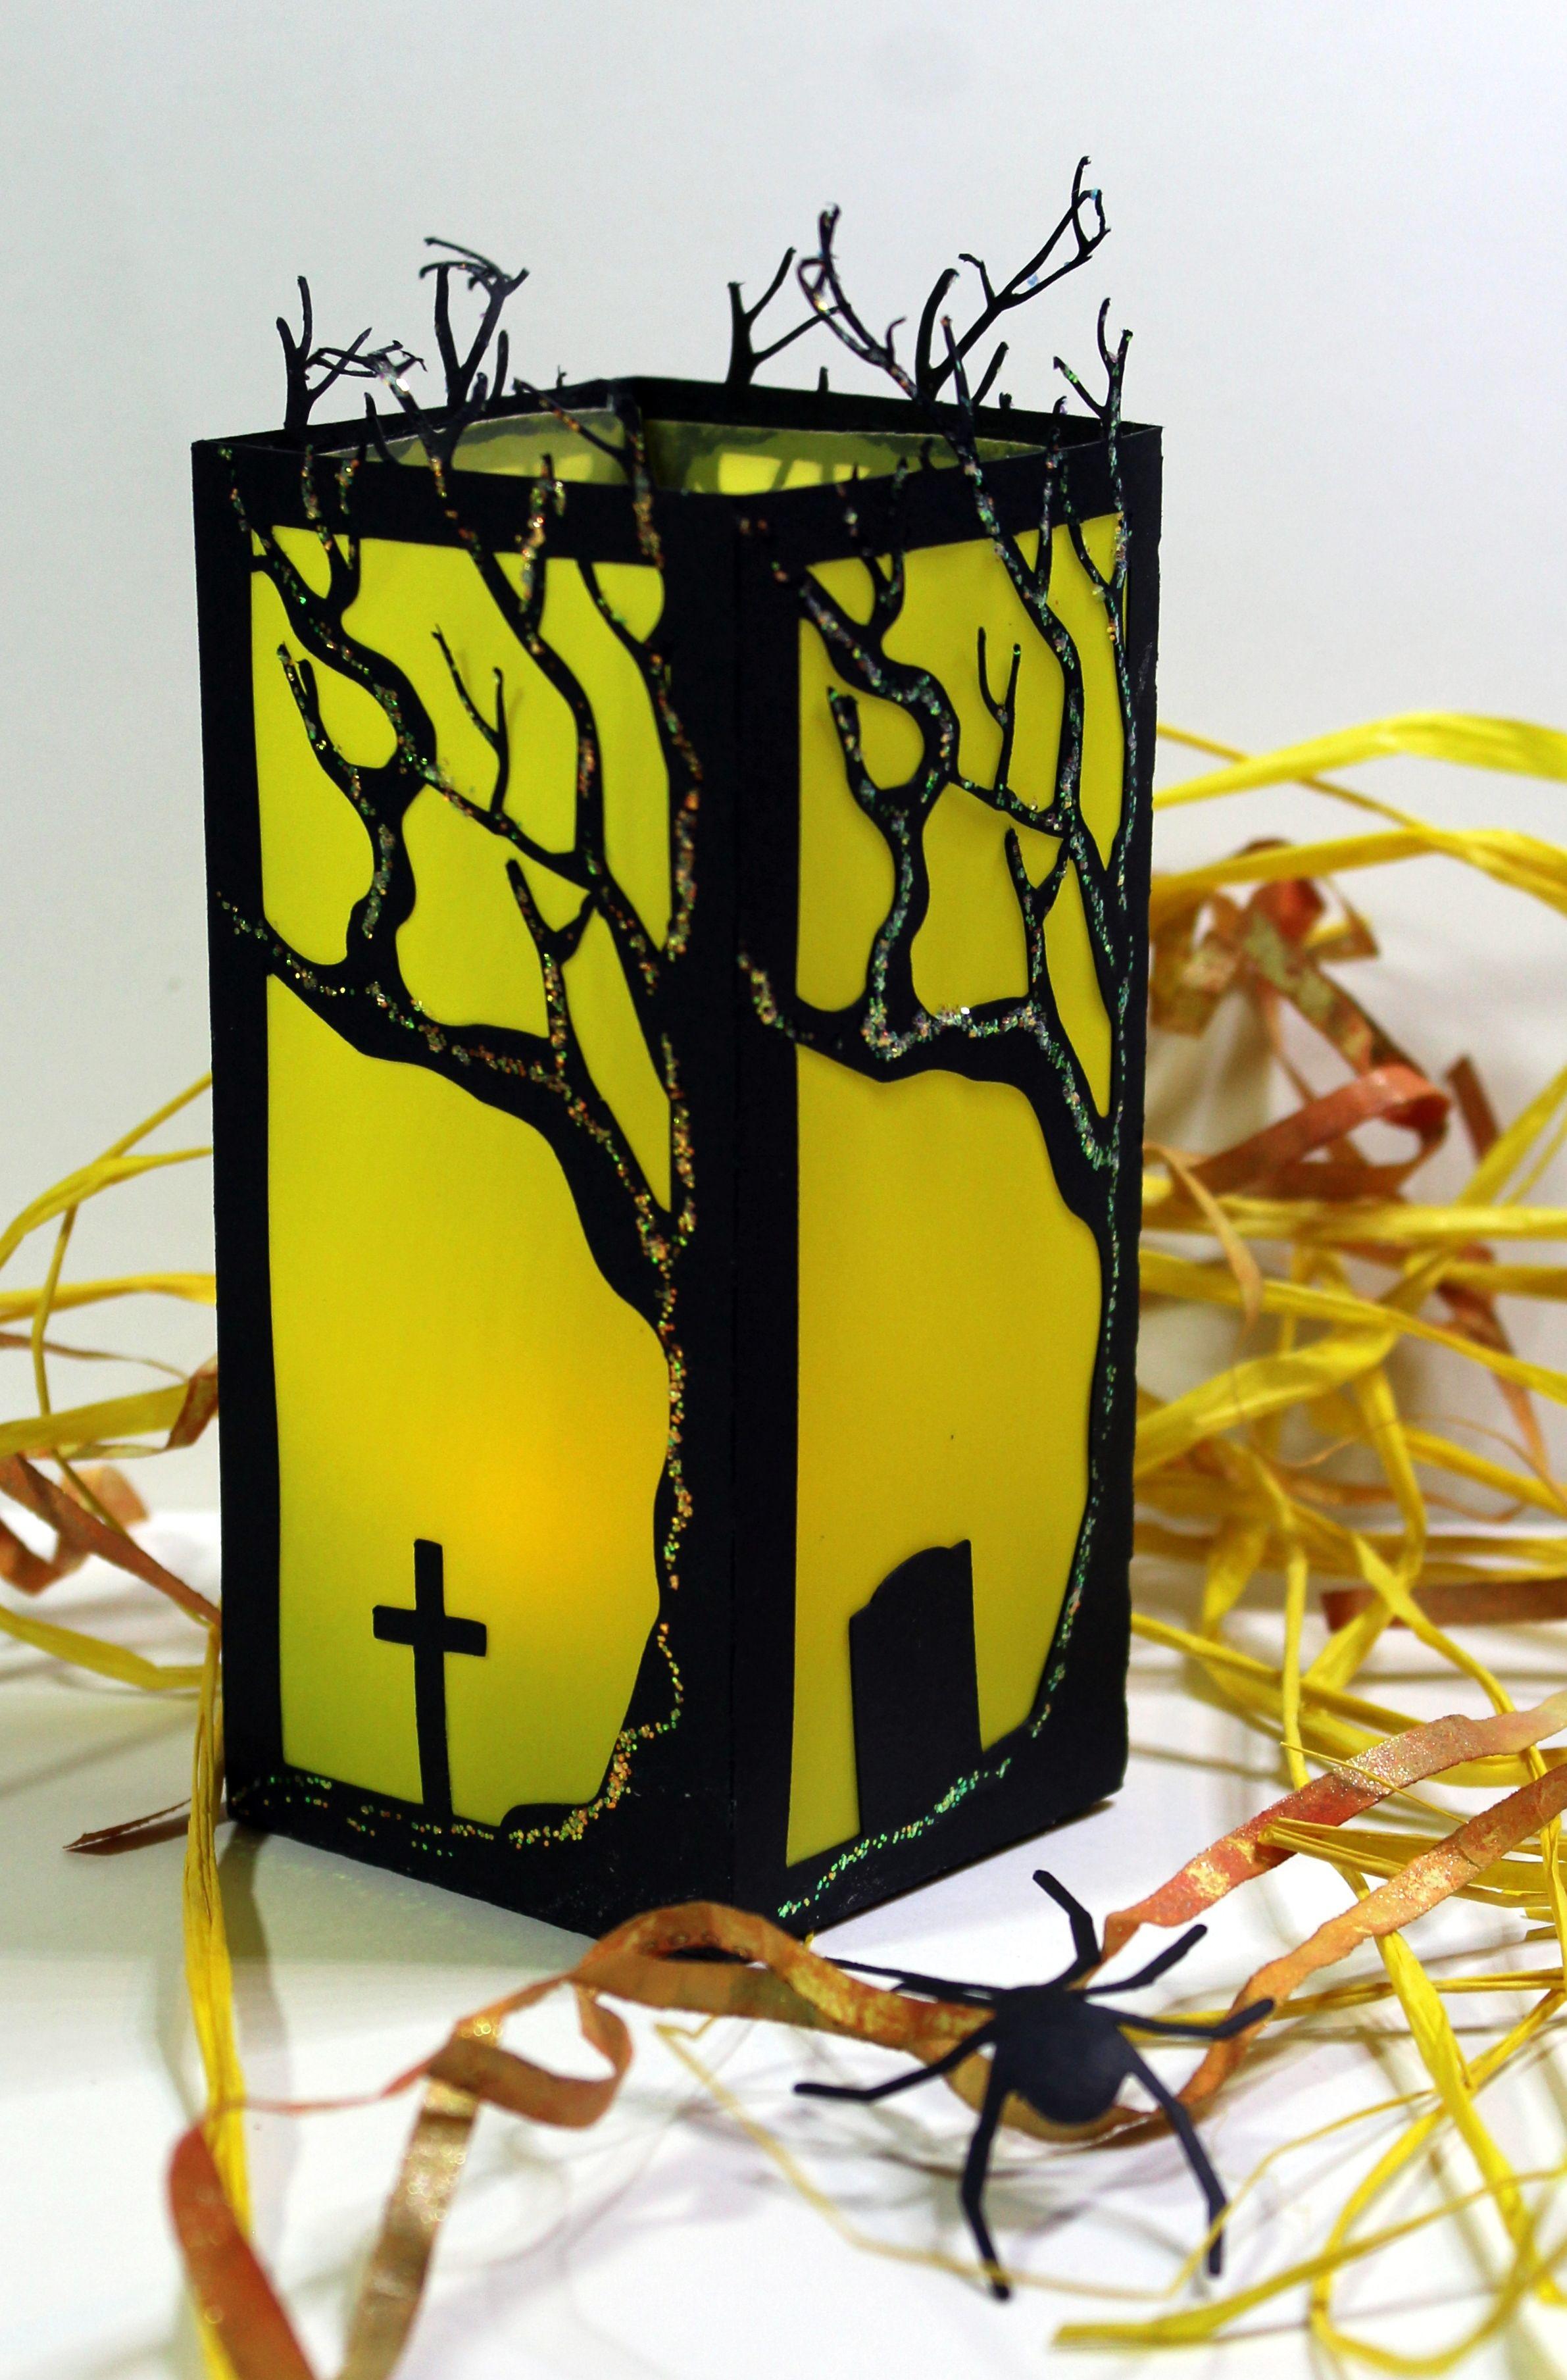 Cemetery Halloween Lantern created on the Silhouette Cameo